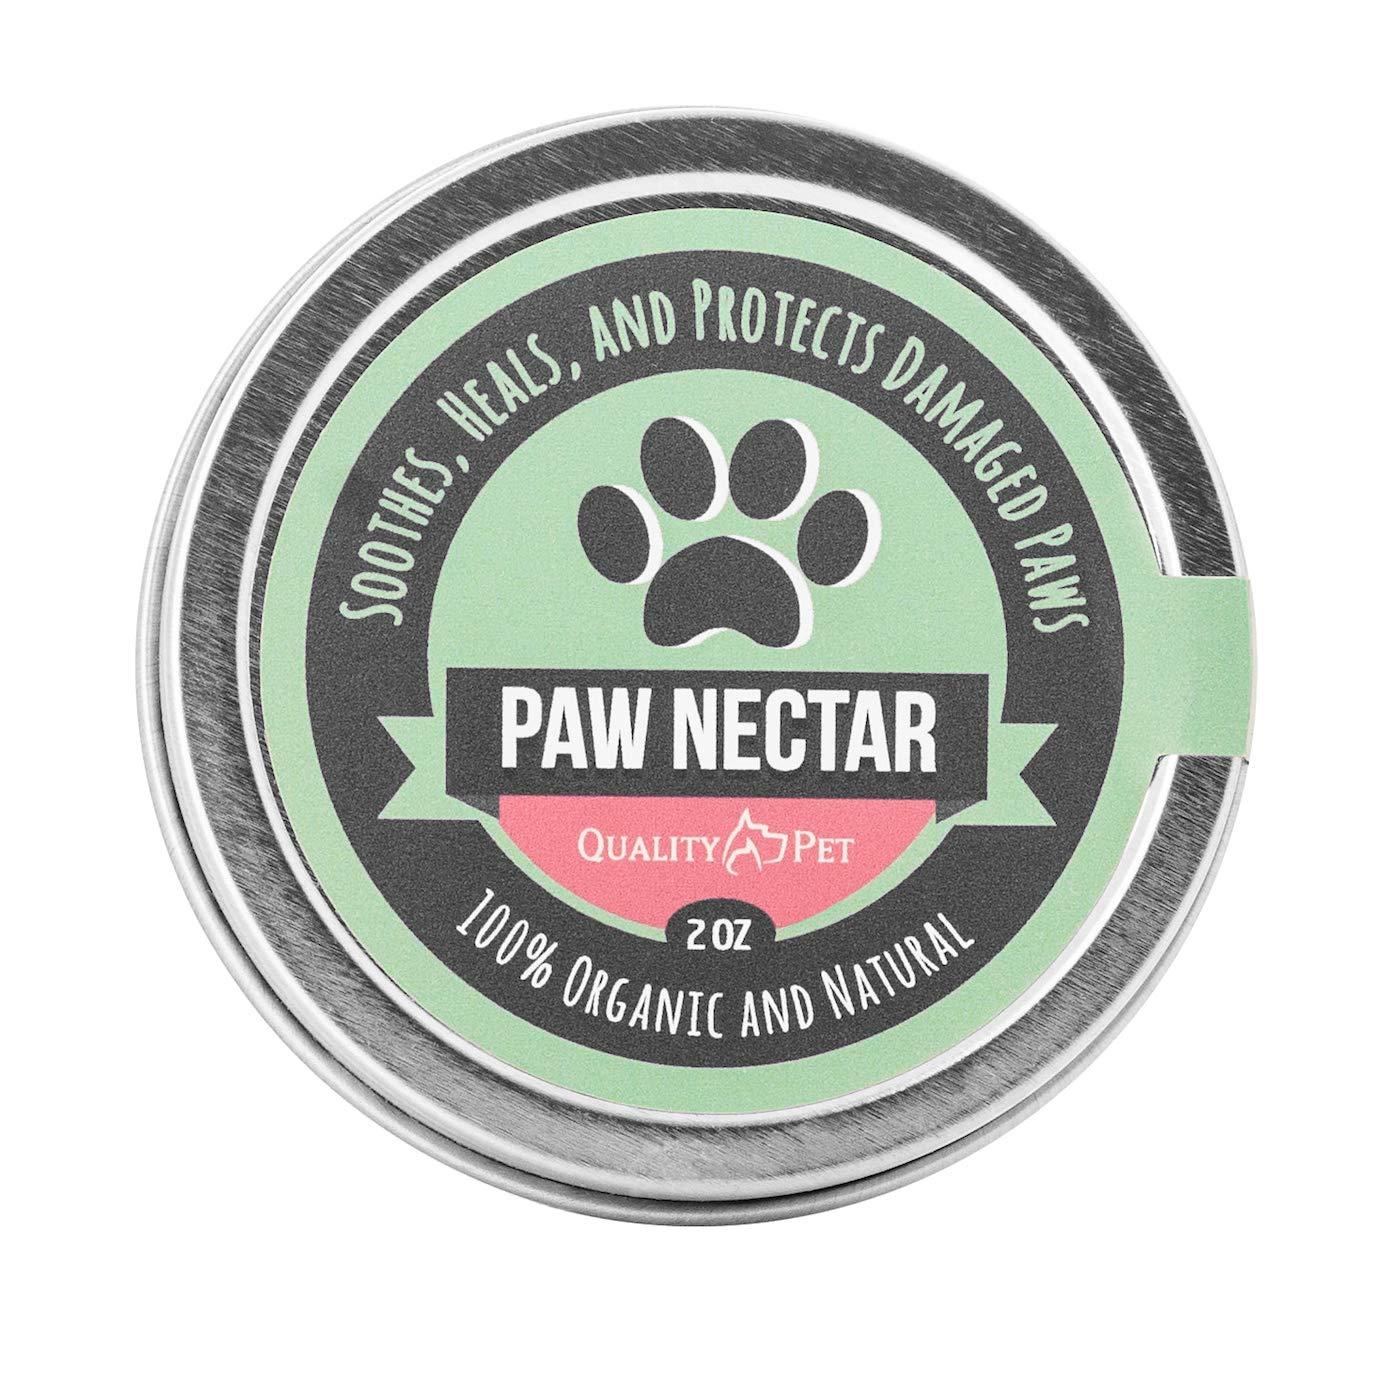 100% Organic and Natural Paw Wax Heals and Repairs Damaged Dog Paws 719iNuwAA-L